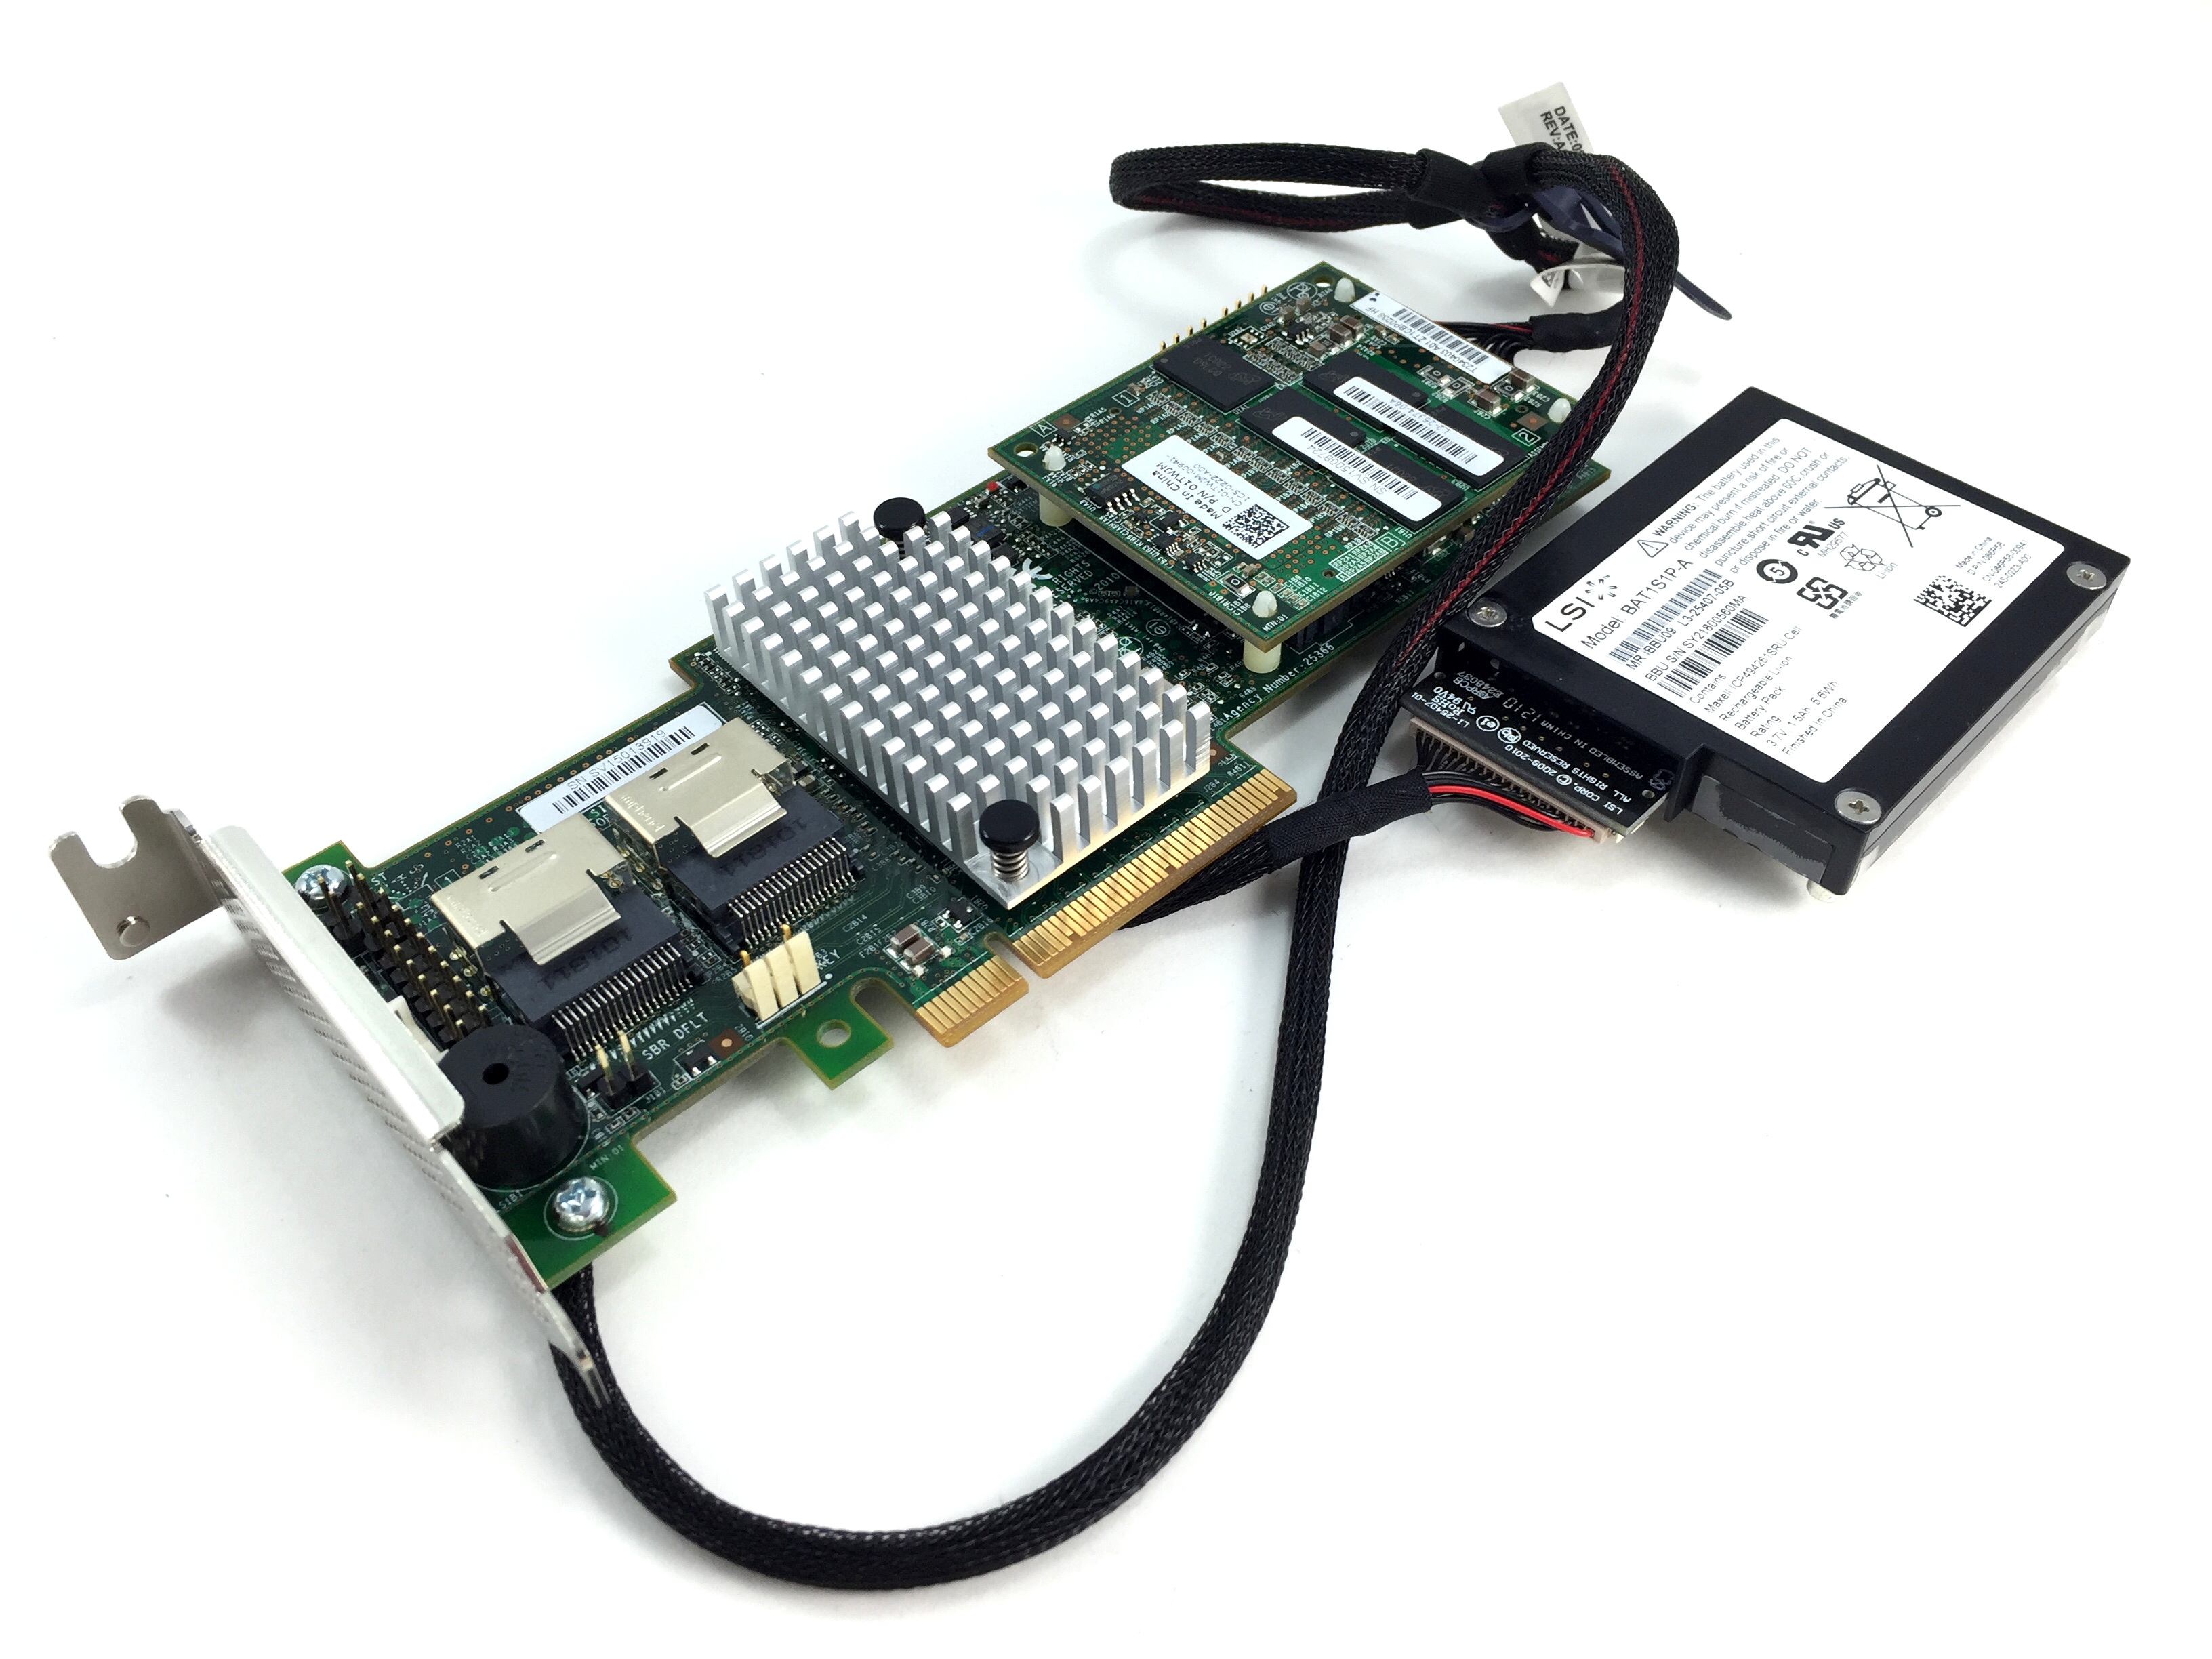 Dell LSI 9265-8I 6Gbps SAS/SATA Raid Controller (0FVJR2)